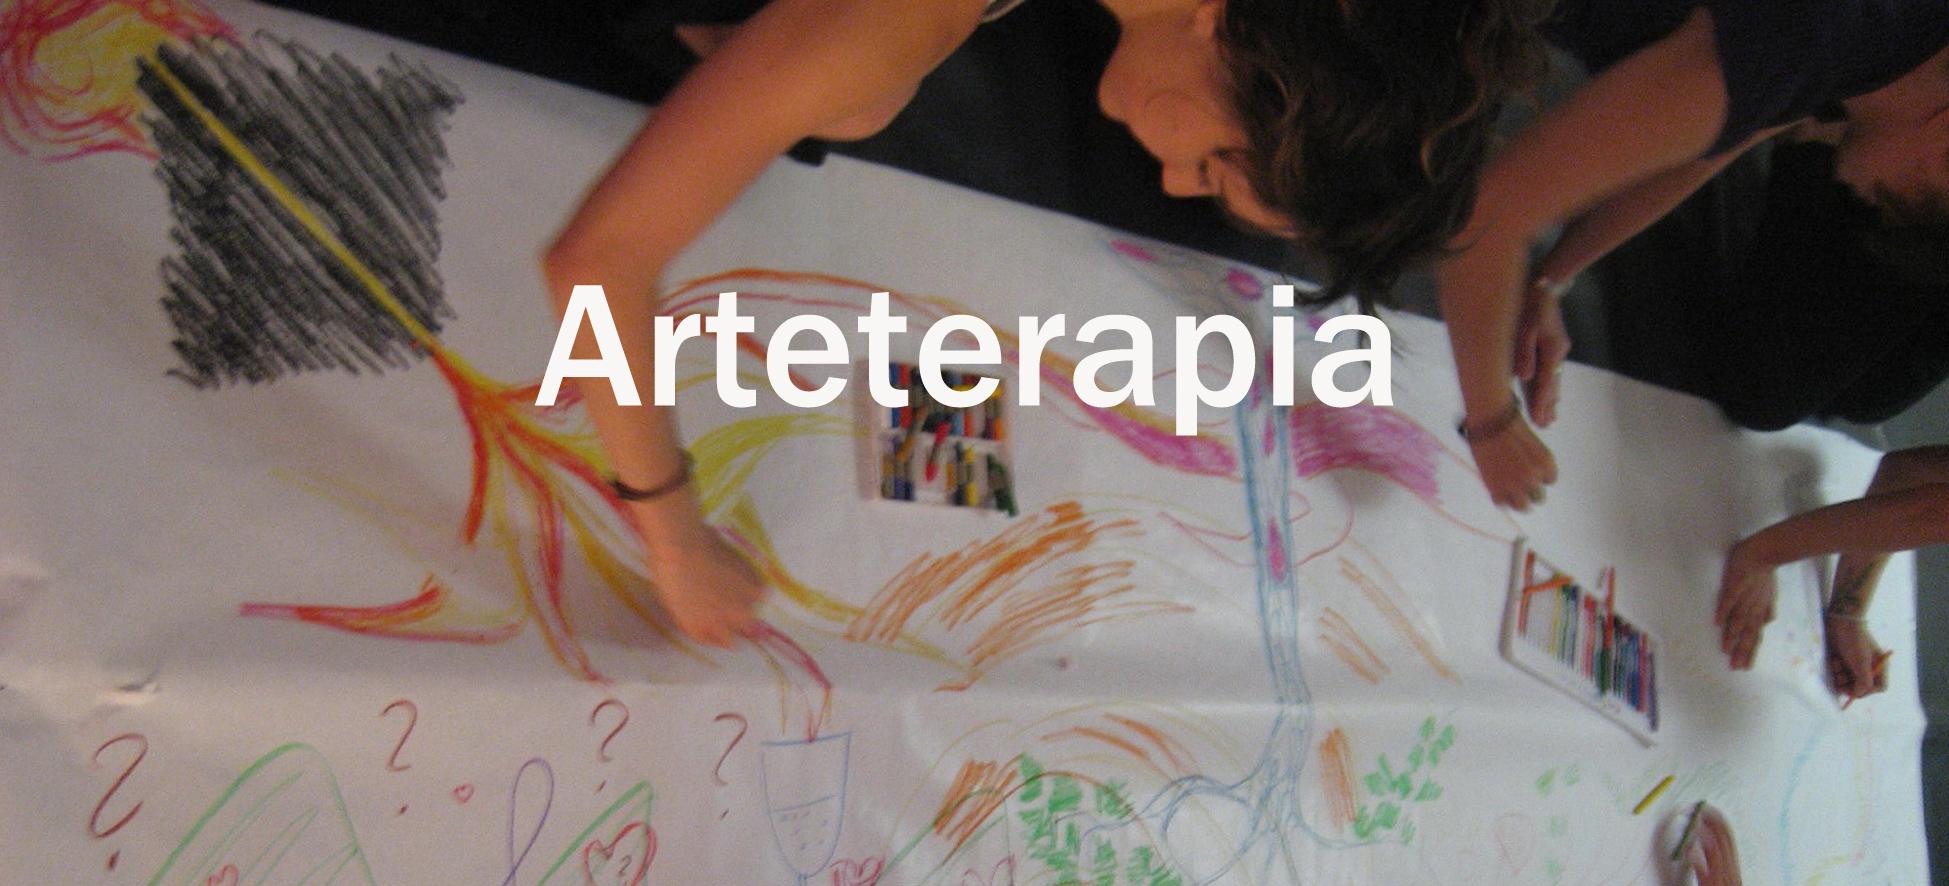 arteterapia 2.jpg